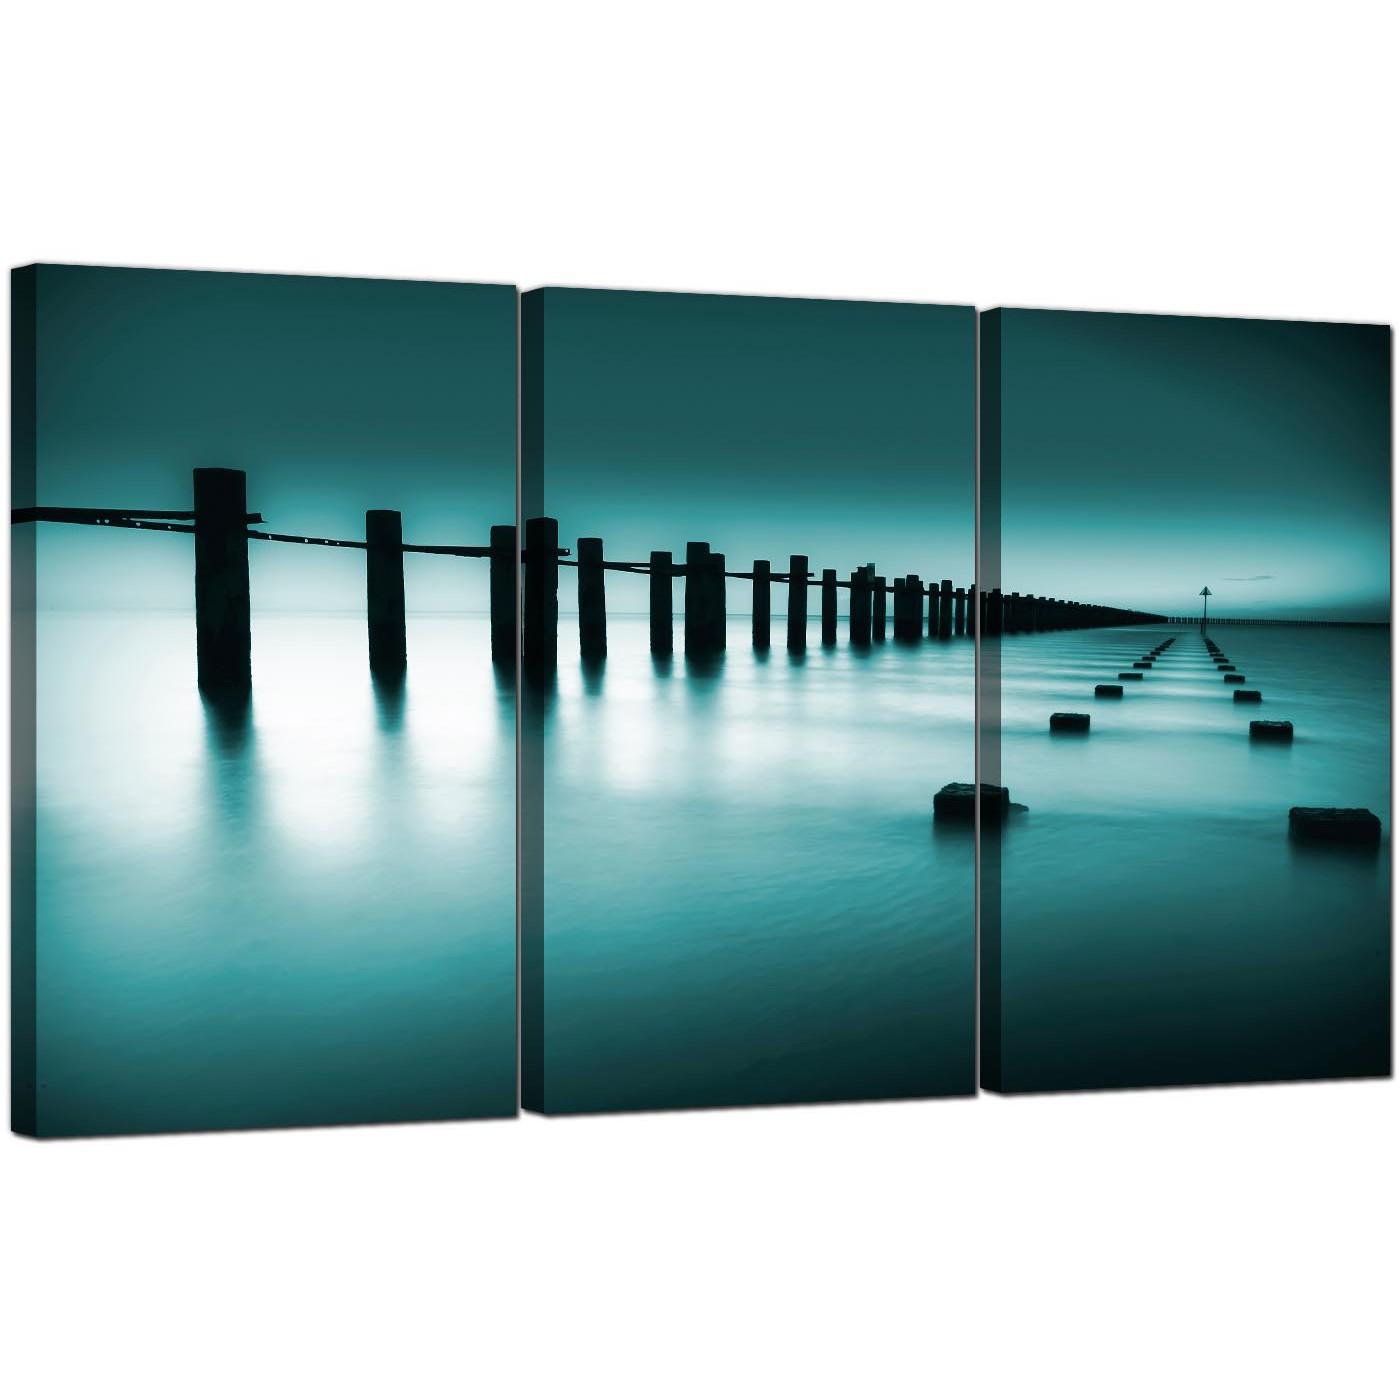 display gallery item 5 3 part seaside canvas wall art blue green sea display gallery item 6